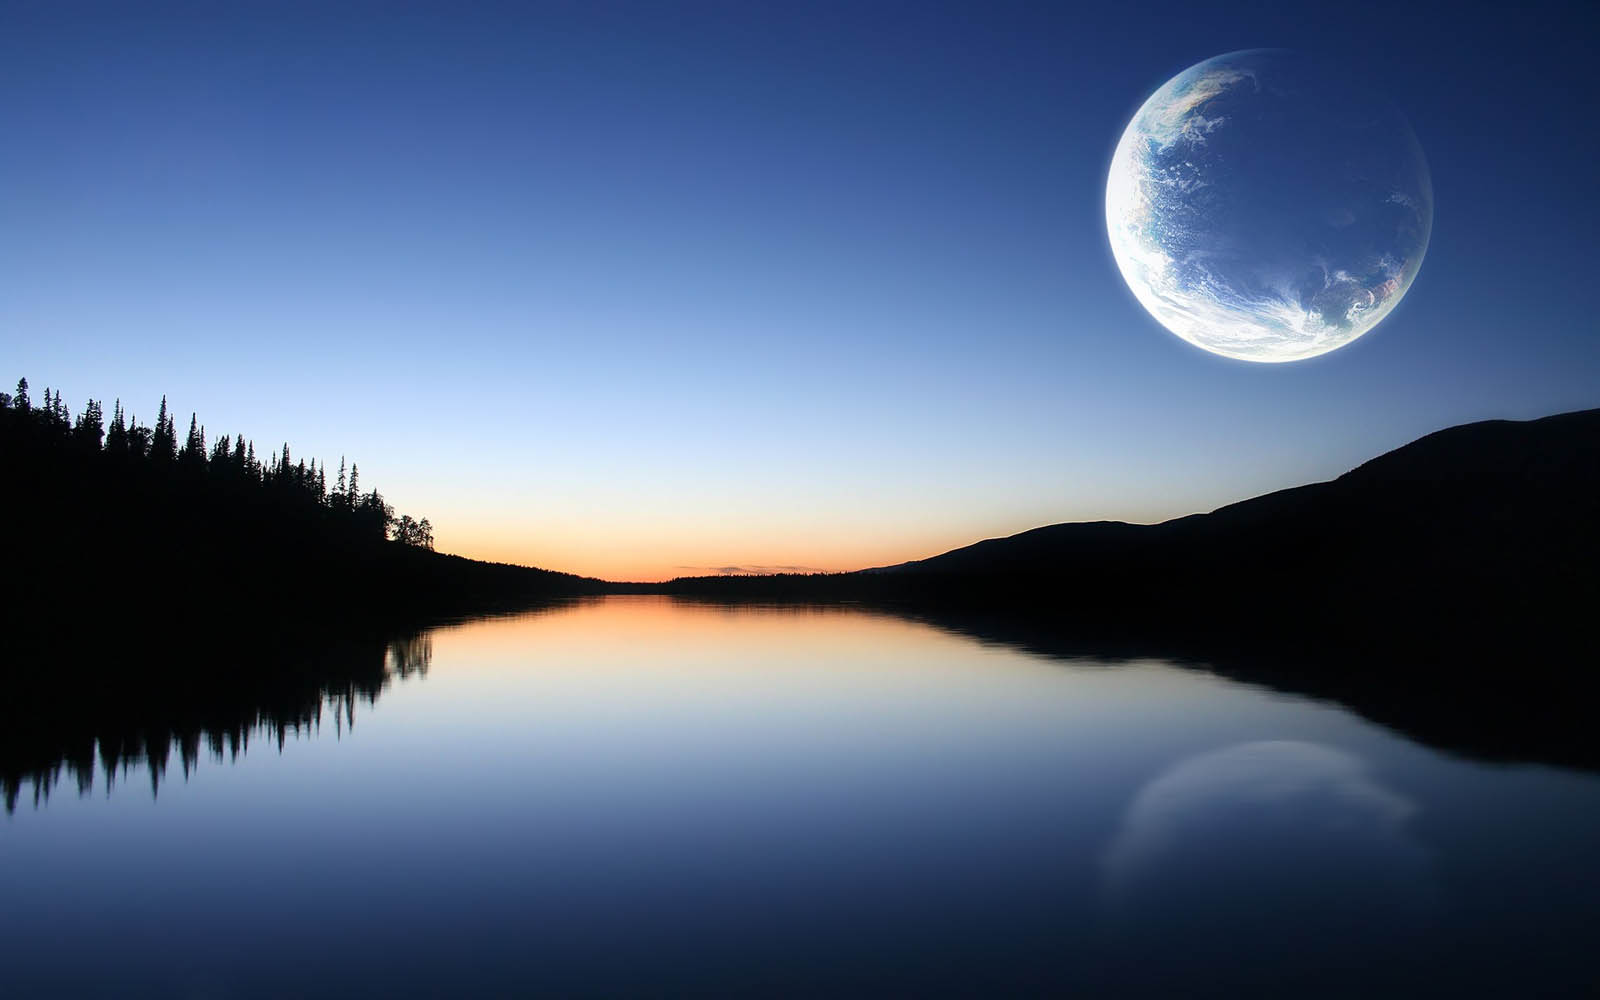 Moon Desktop Wallpapers Others Photo Wallpaper 1600x1000